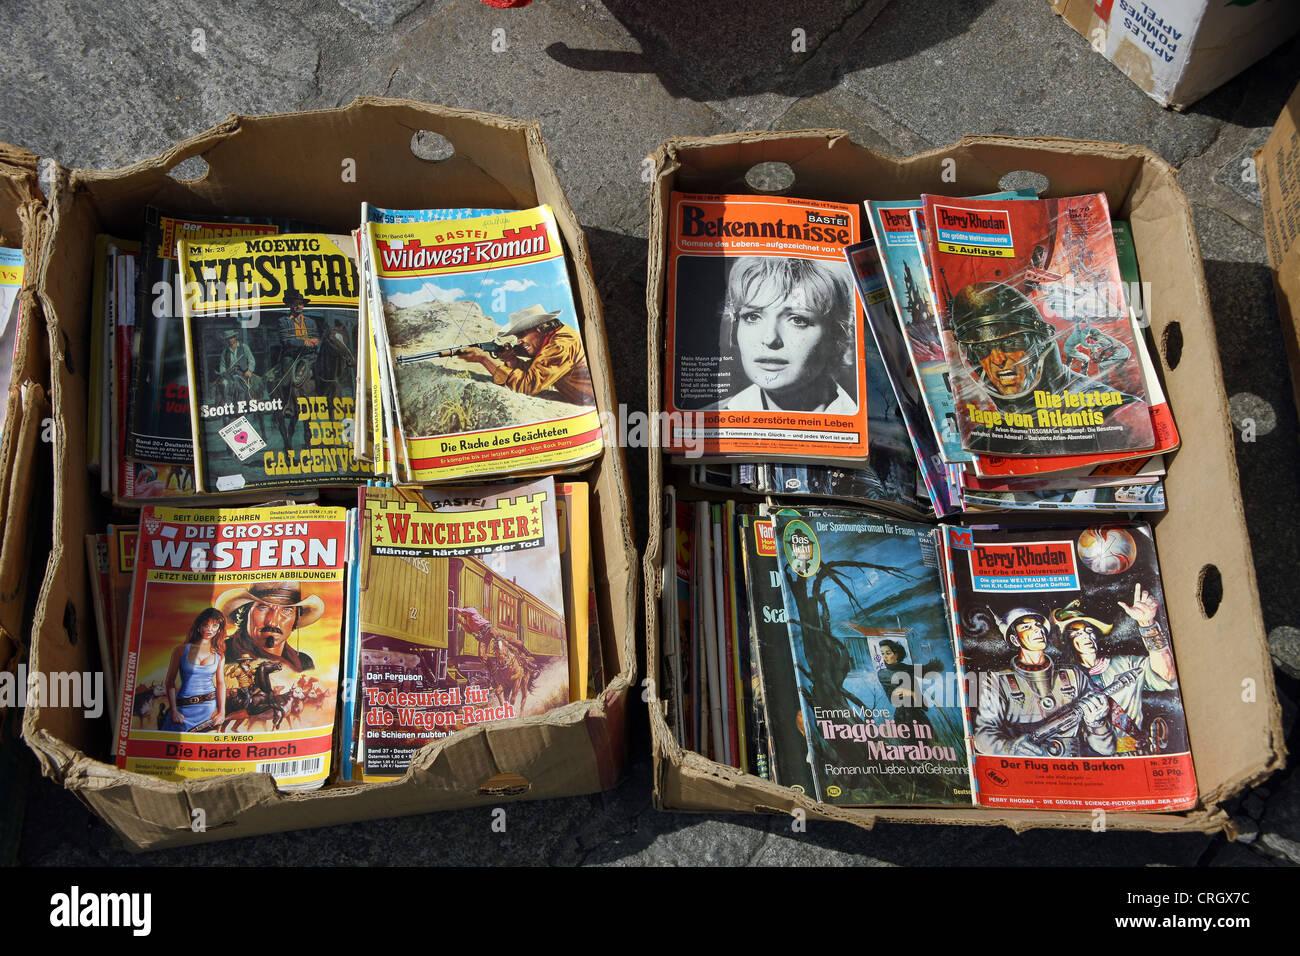 Flea Market, Wild West novels - Stock Image